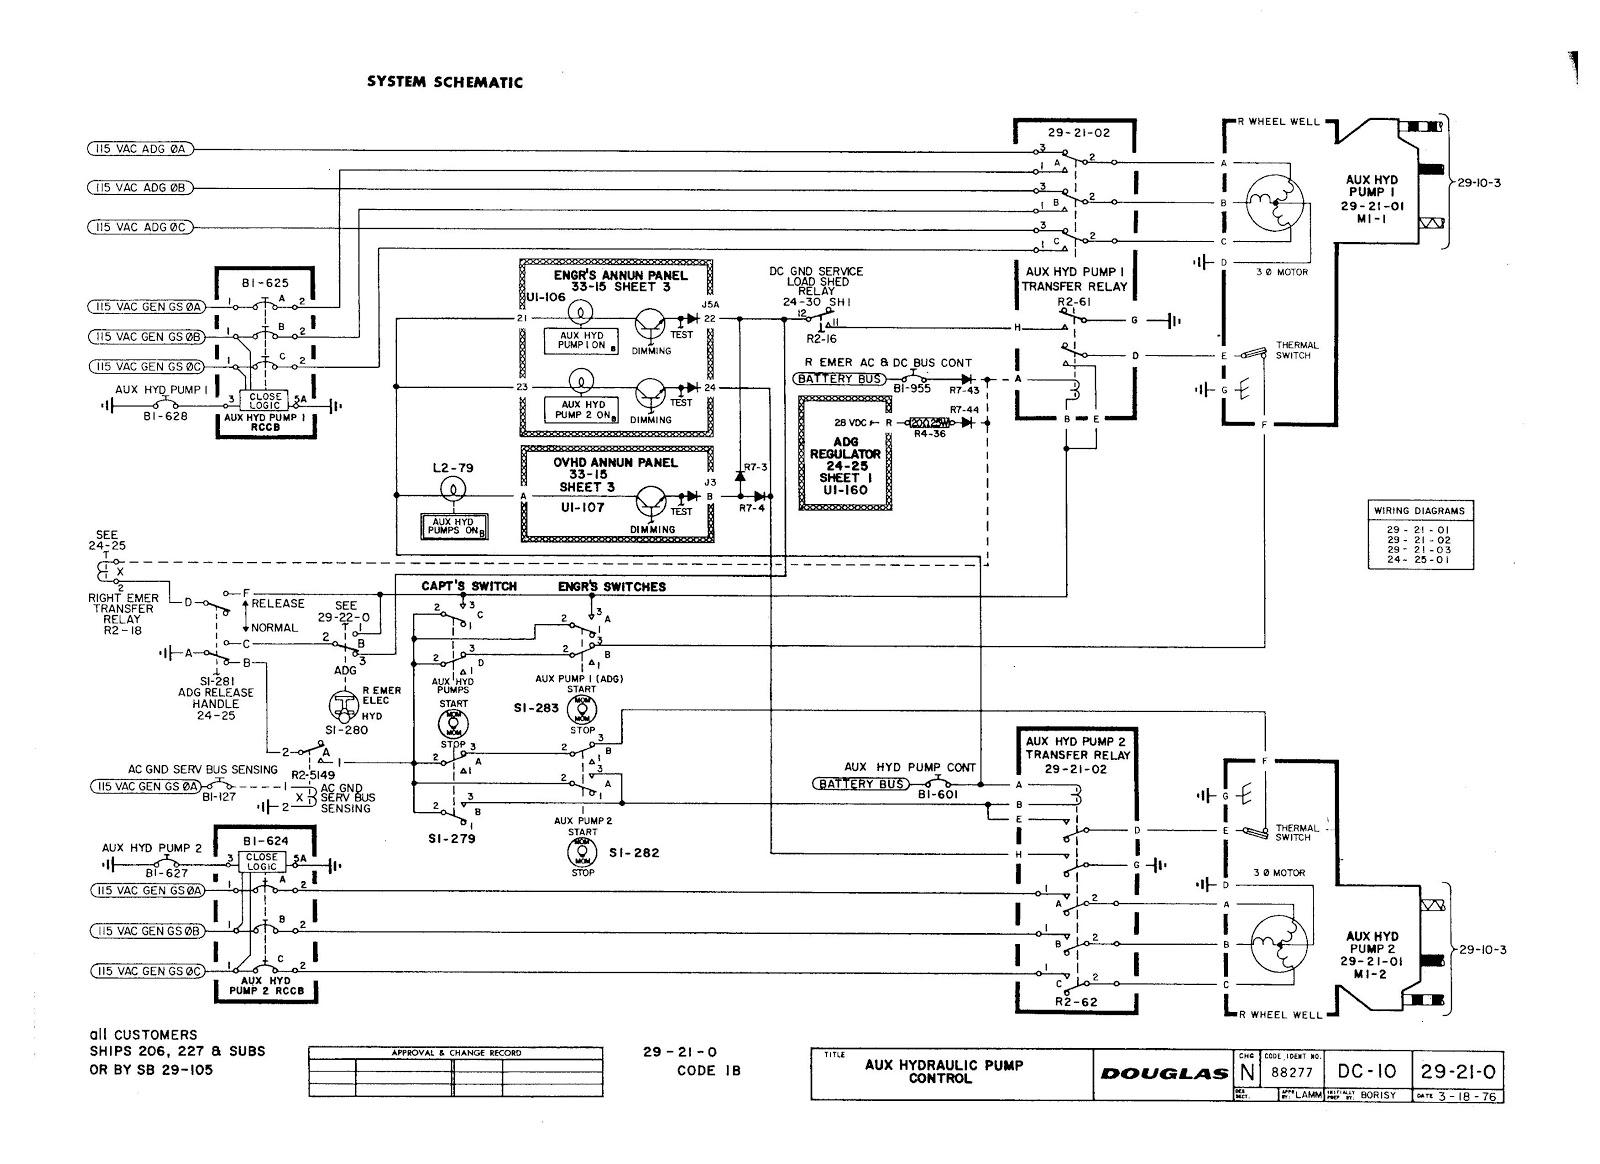 Outstanding Elementary Wiring Diagrams Download Wiring Diagram Wiring Cloud Eachirenstrafr09Org